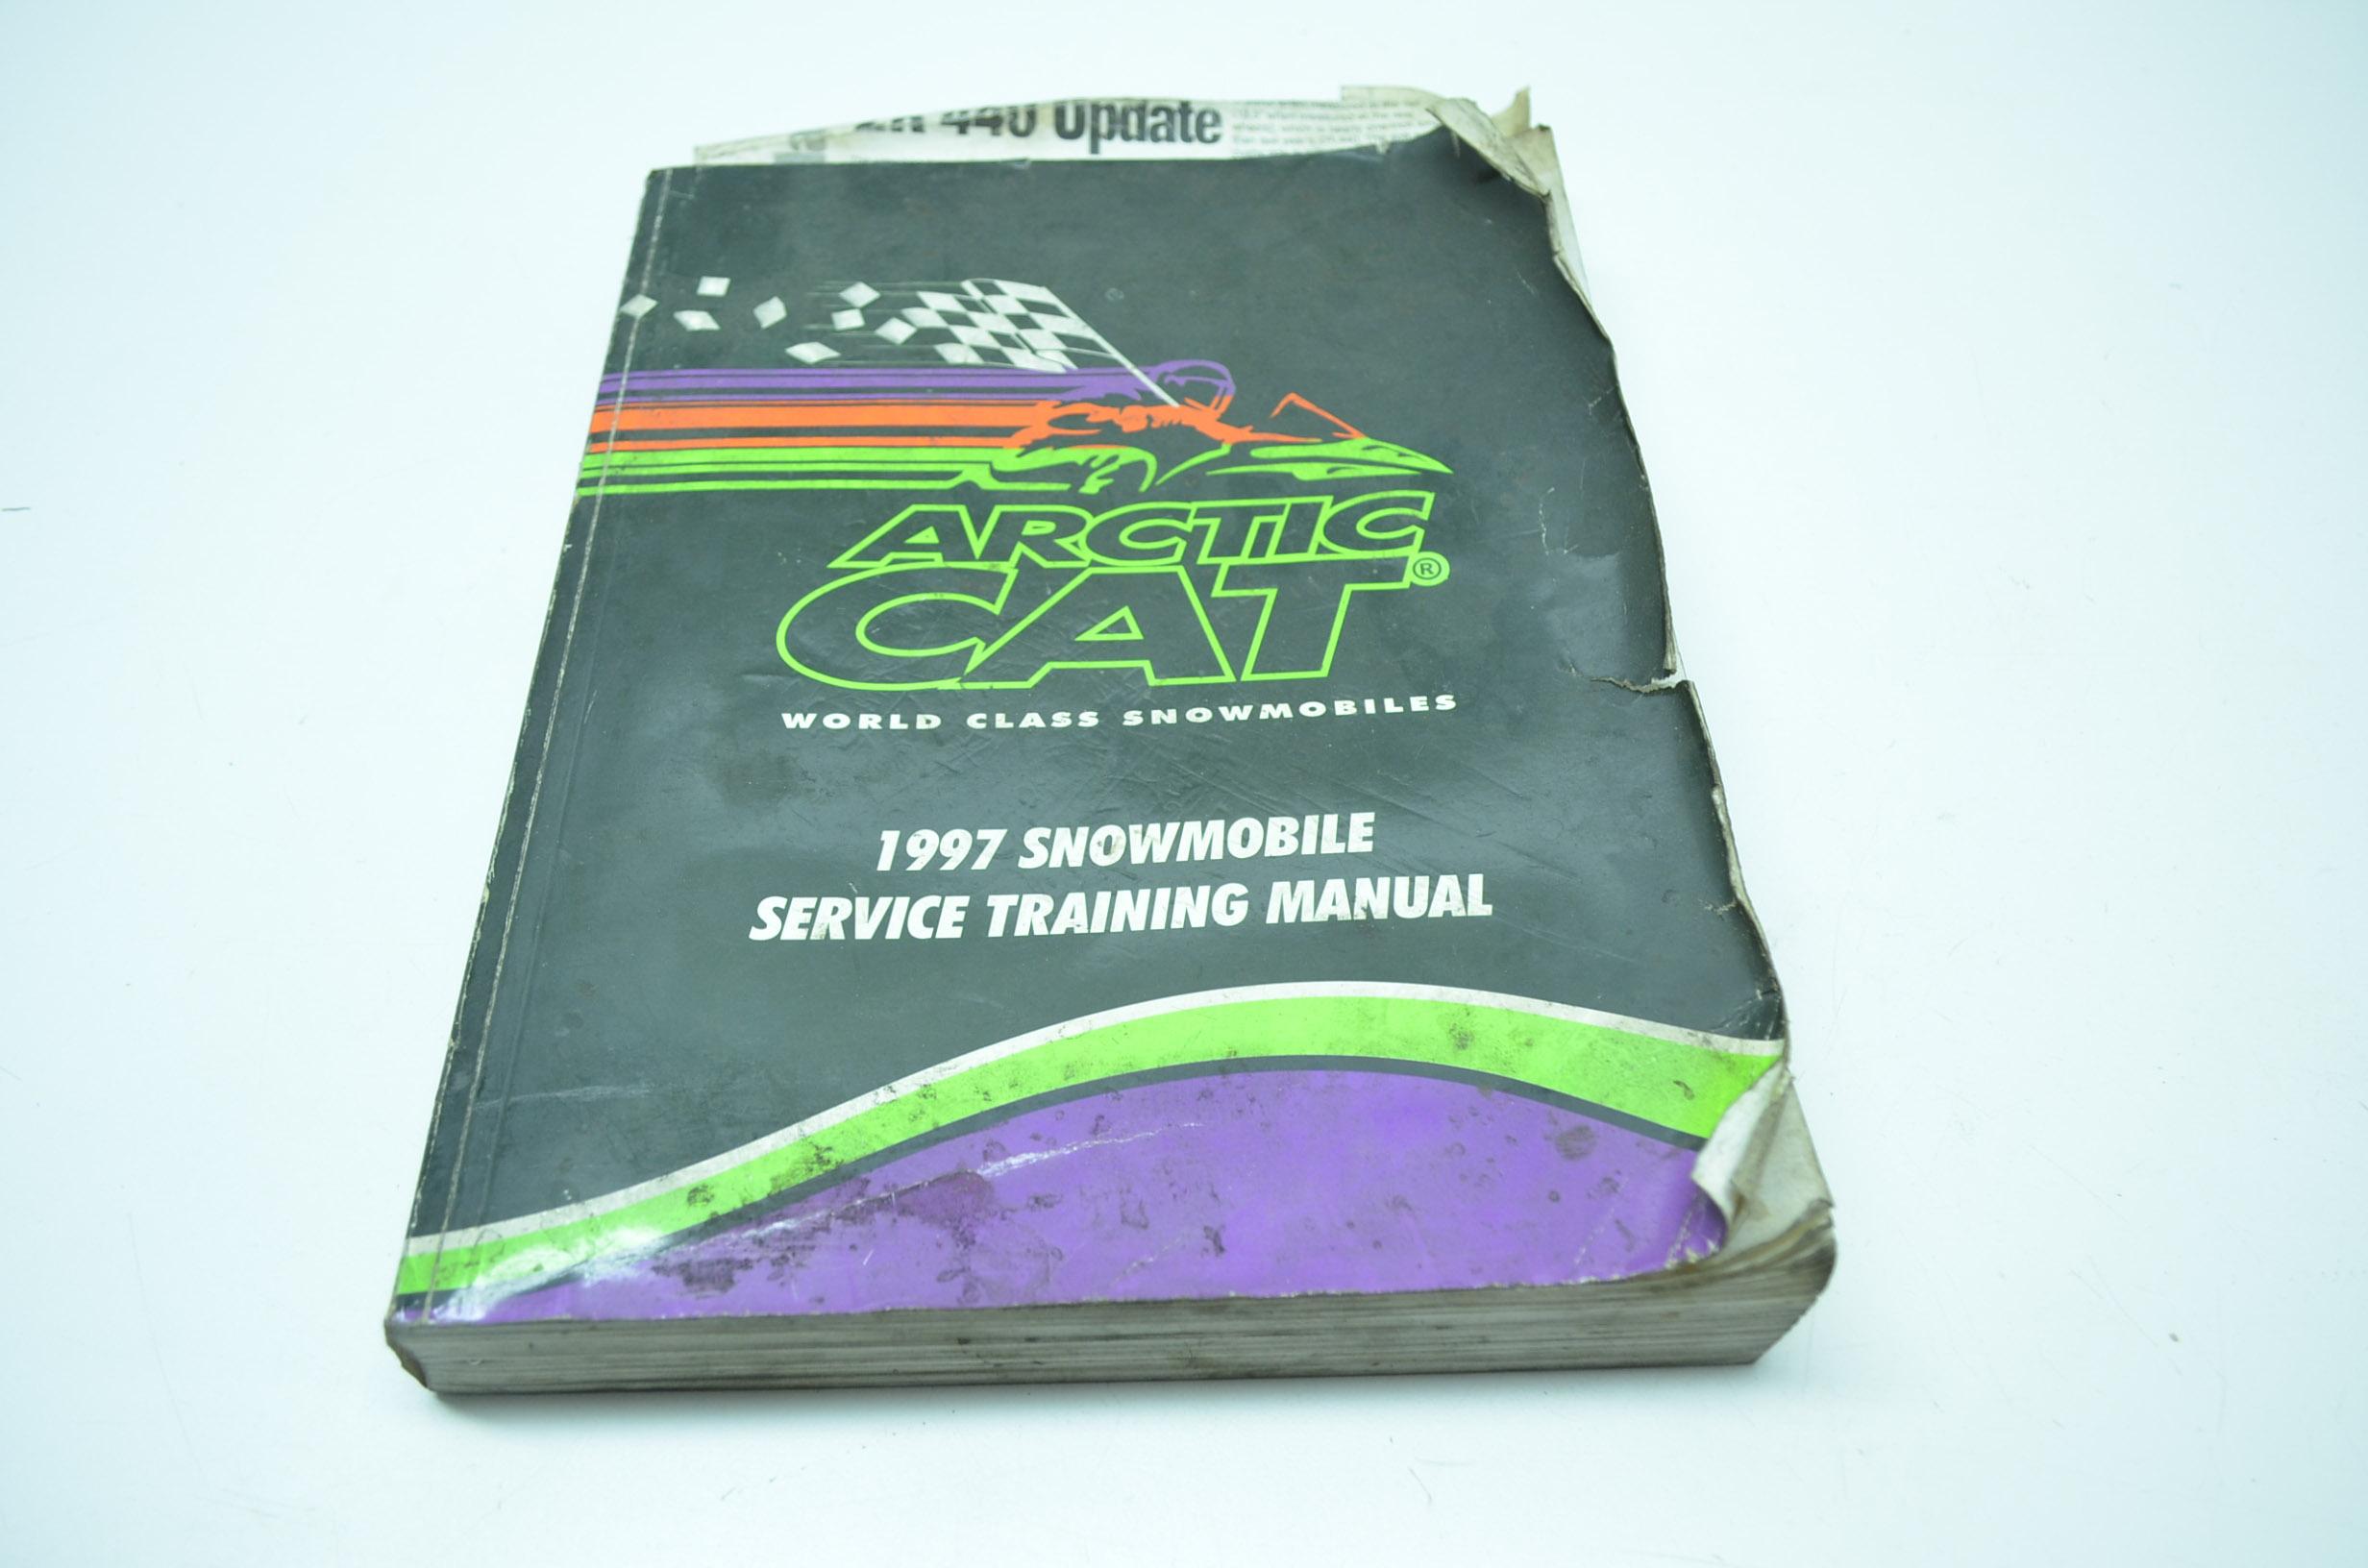 OEM Arctic Cat 1997 Snowmobile Service Training Manual 2255-572